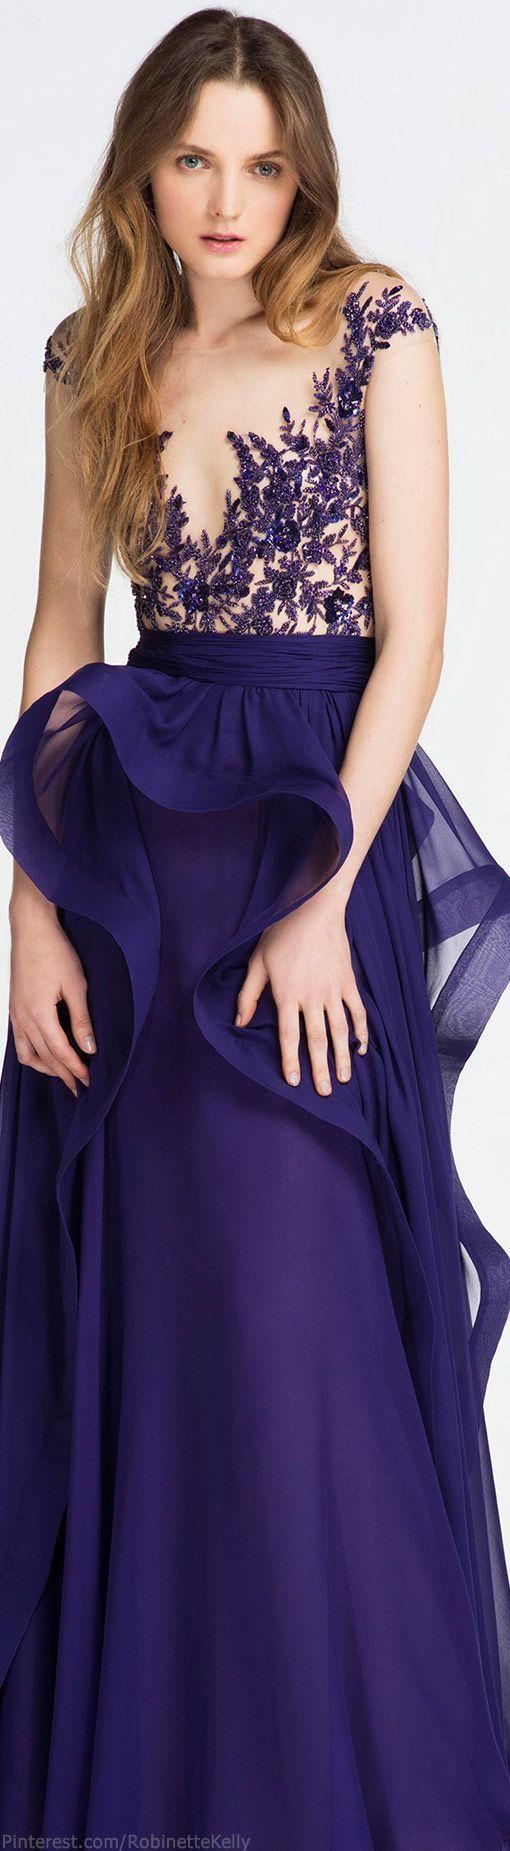 Unique Sequin Navy Prom Dress - La Femme 18898 Navy Blue Evening Gown - RissyRoos.com